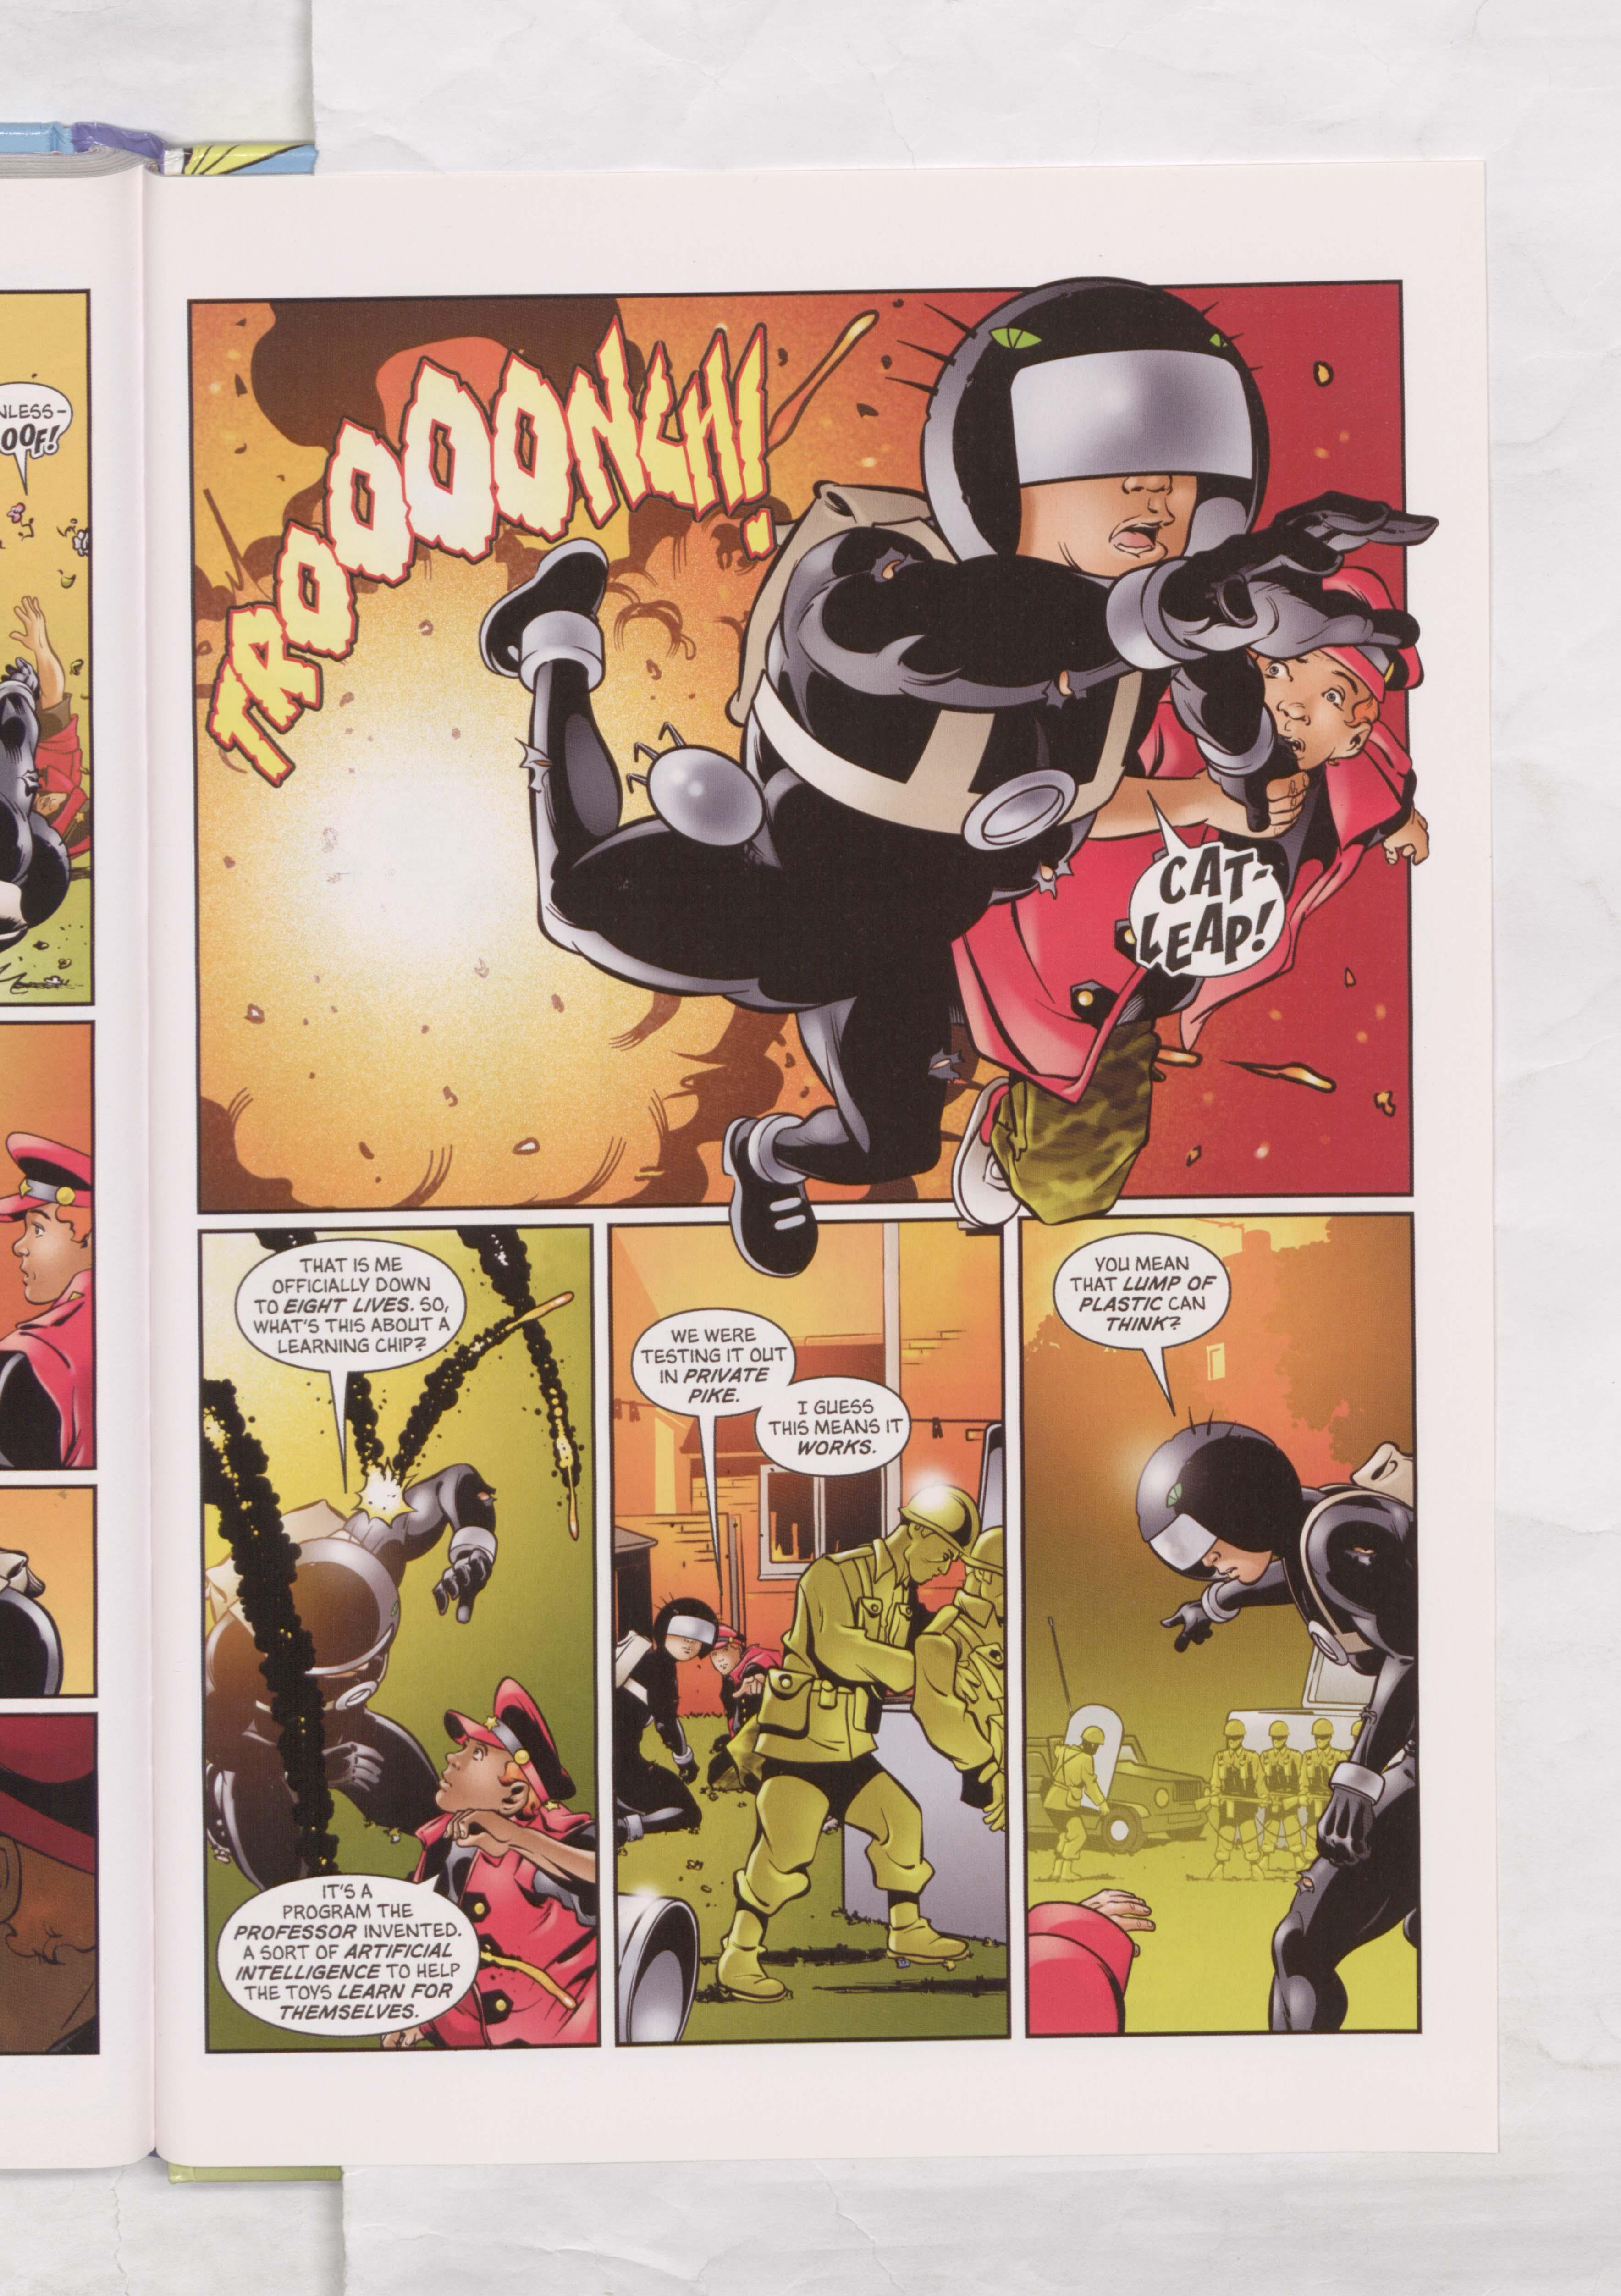 Billy the Cat versus General Jumbo! - Beano Annual 2008